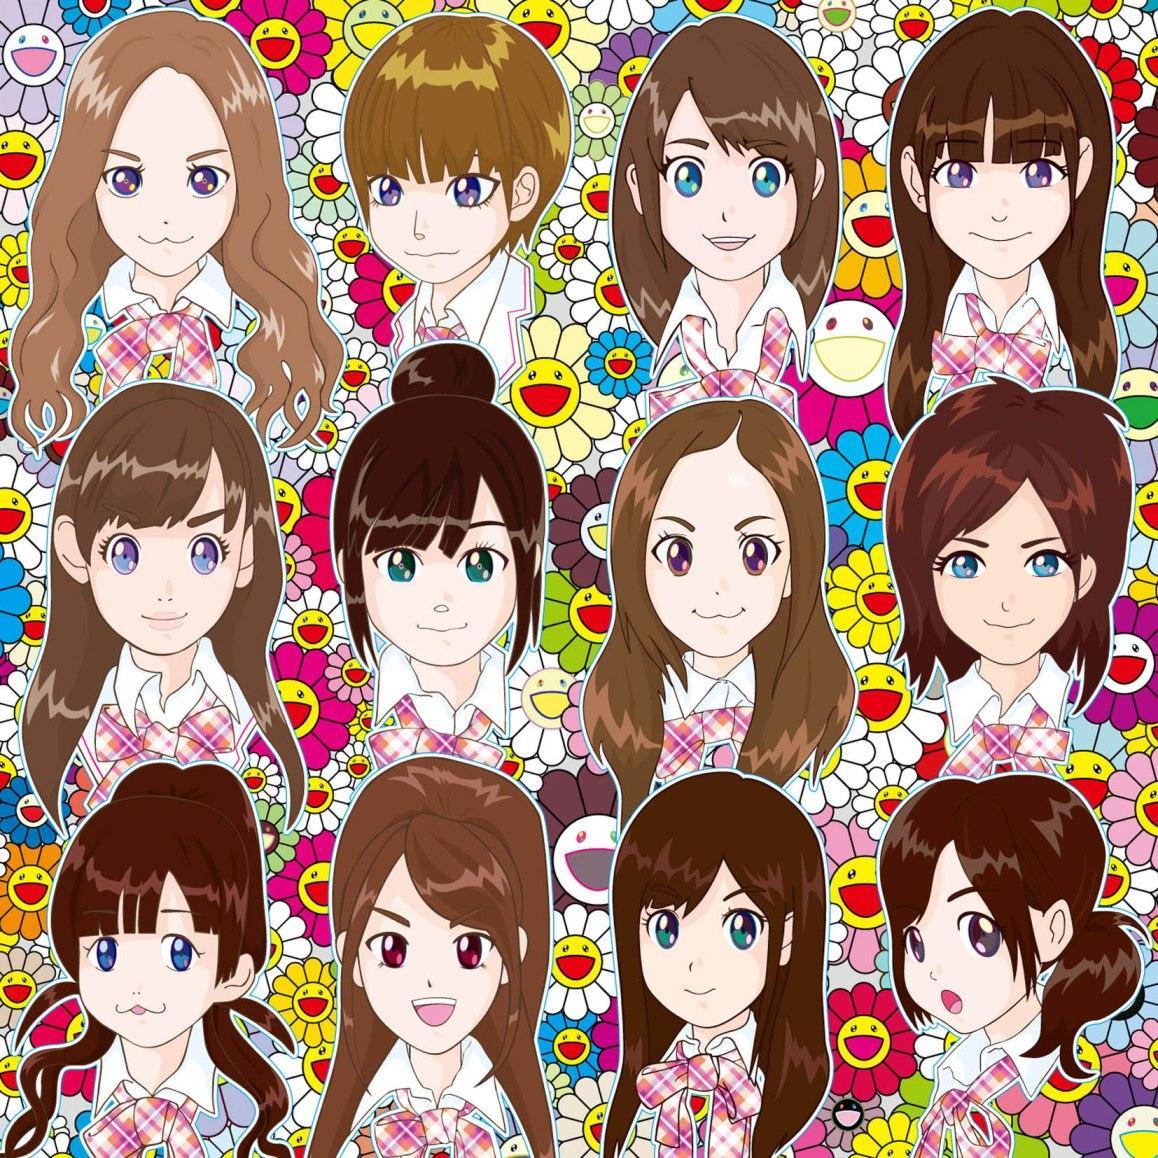 [Single] AKB48 - 涙サプライズ! (Namida Surprise!) | AKB48 Channel